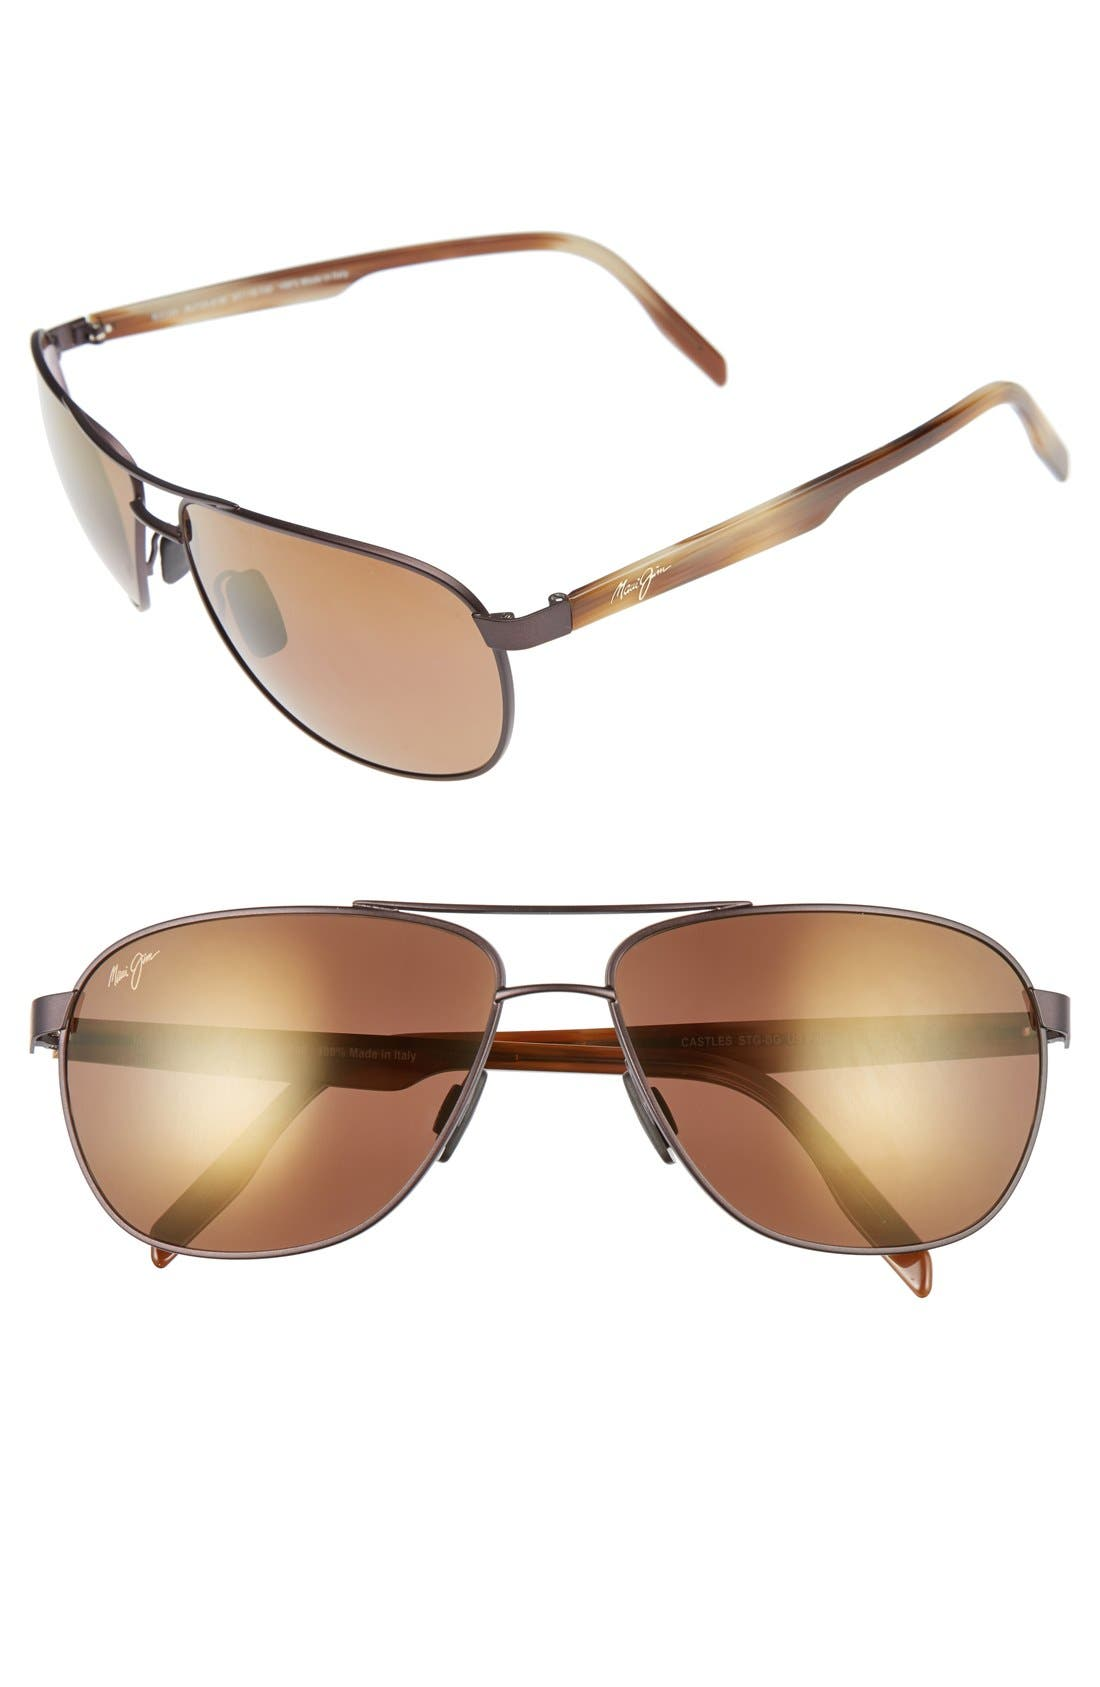 Main Image - Maui Jim 'Castles - PolarizedPlus®2' 61mm Aviator Sunglasses